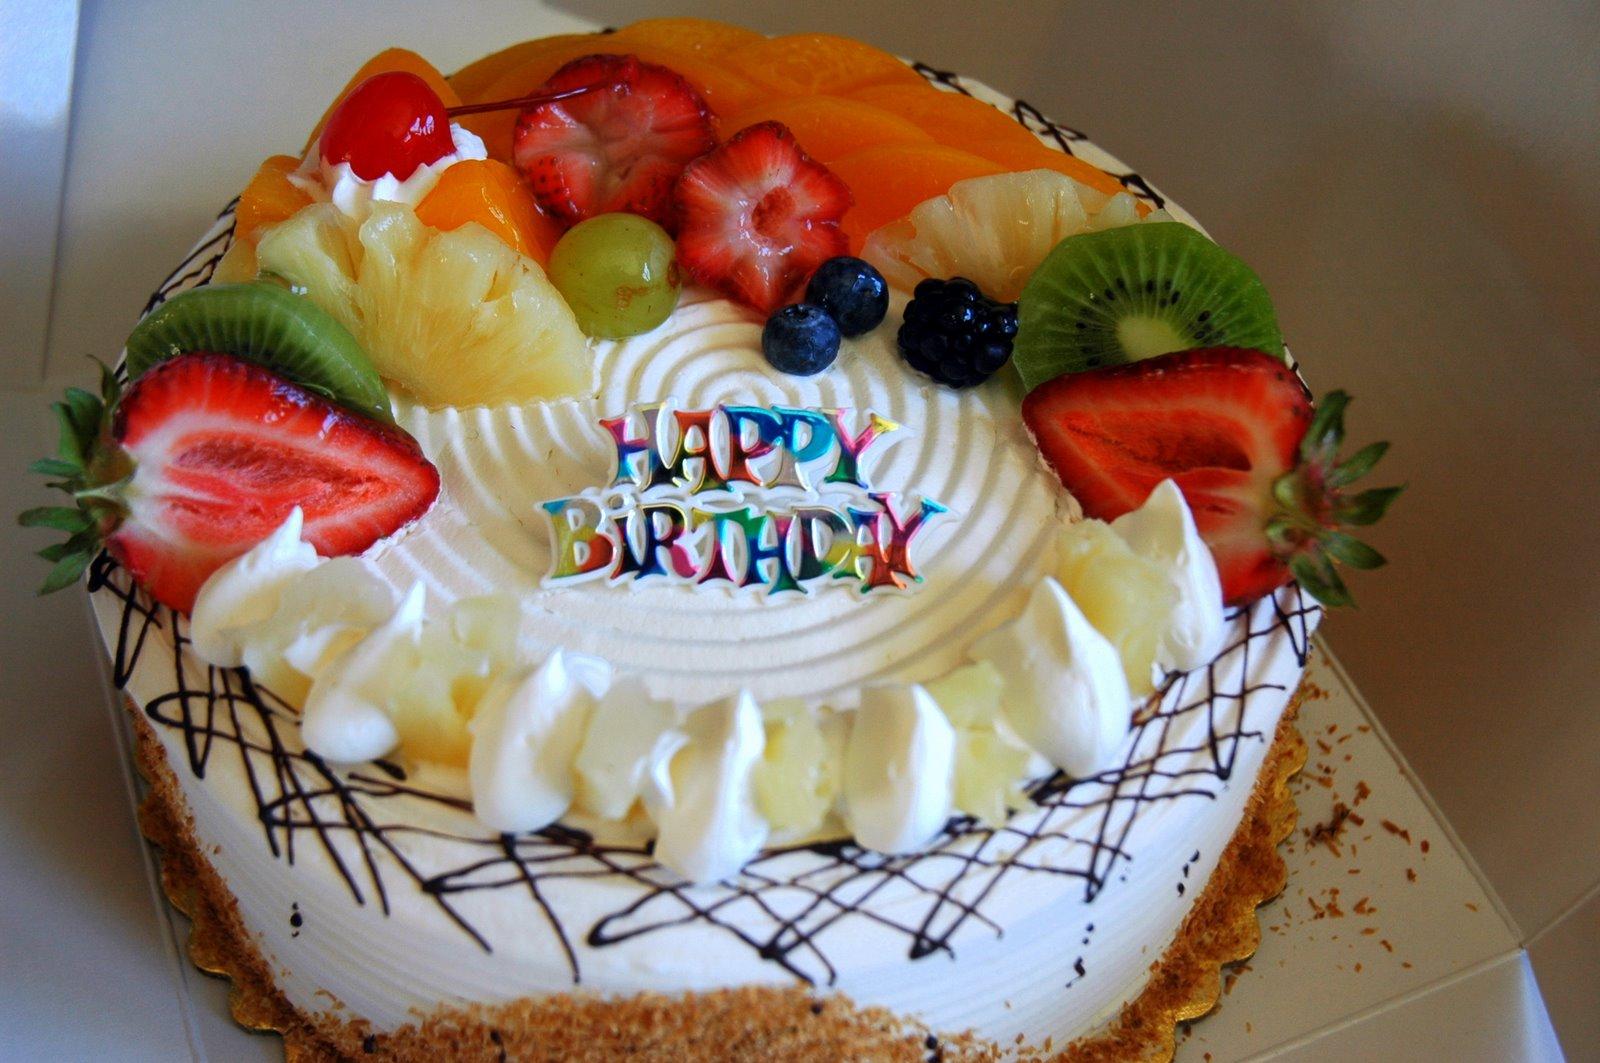 Birthday Cake Images With Name Anil : Happy Birthday Sonam Kapoor ~ Atish Ranjan s World